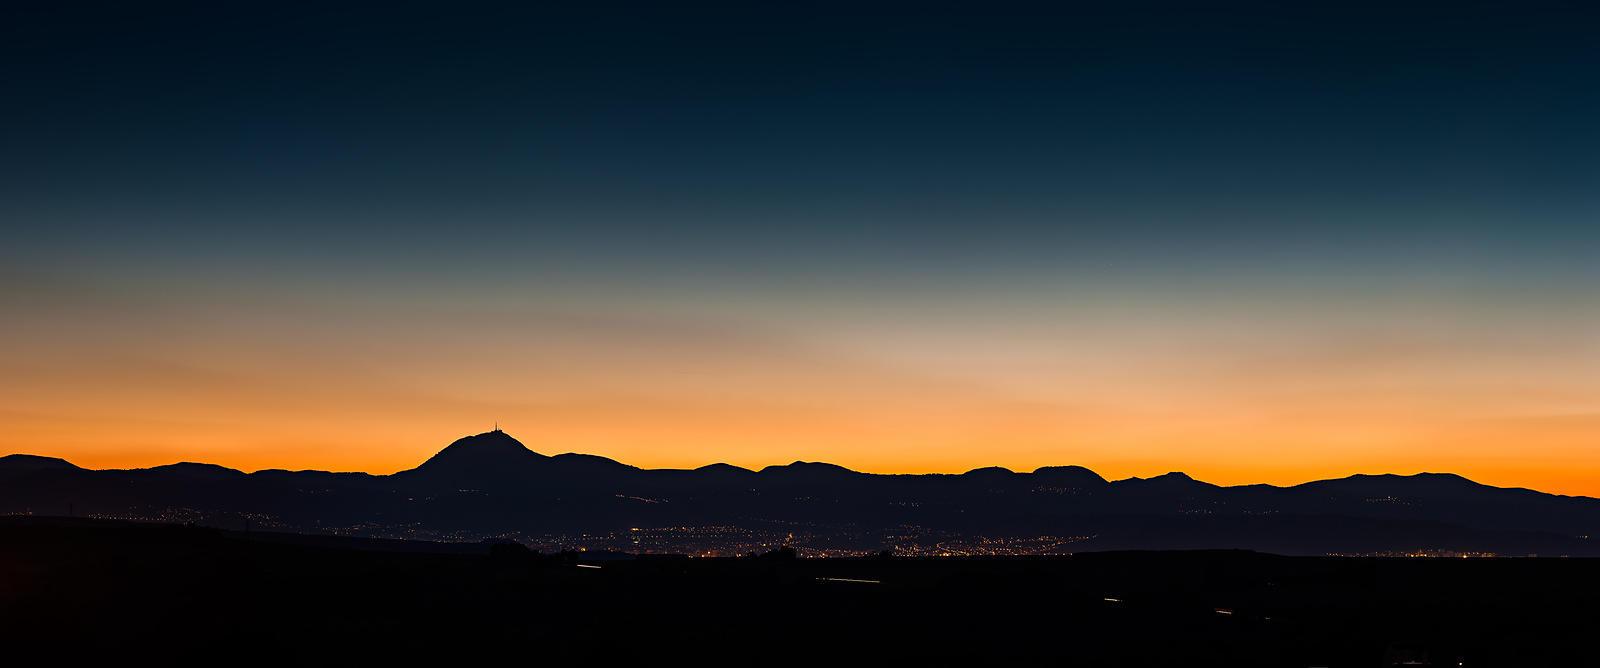 [Image: panorama-chaine-des-puys-crepuscule_uxga.jpg]